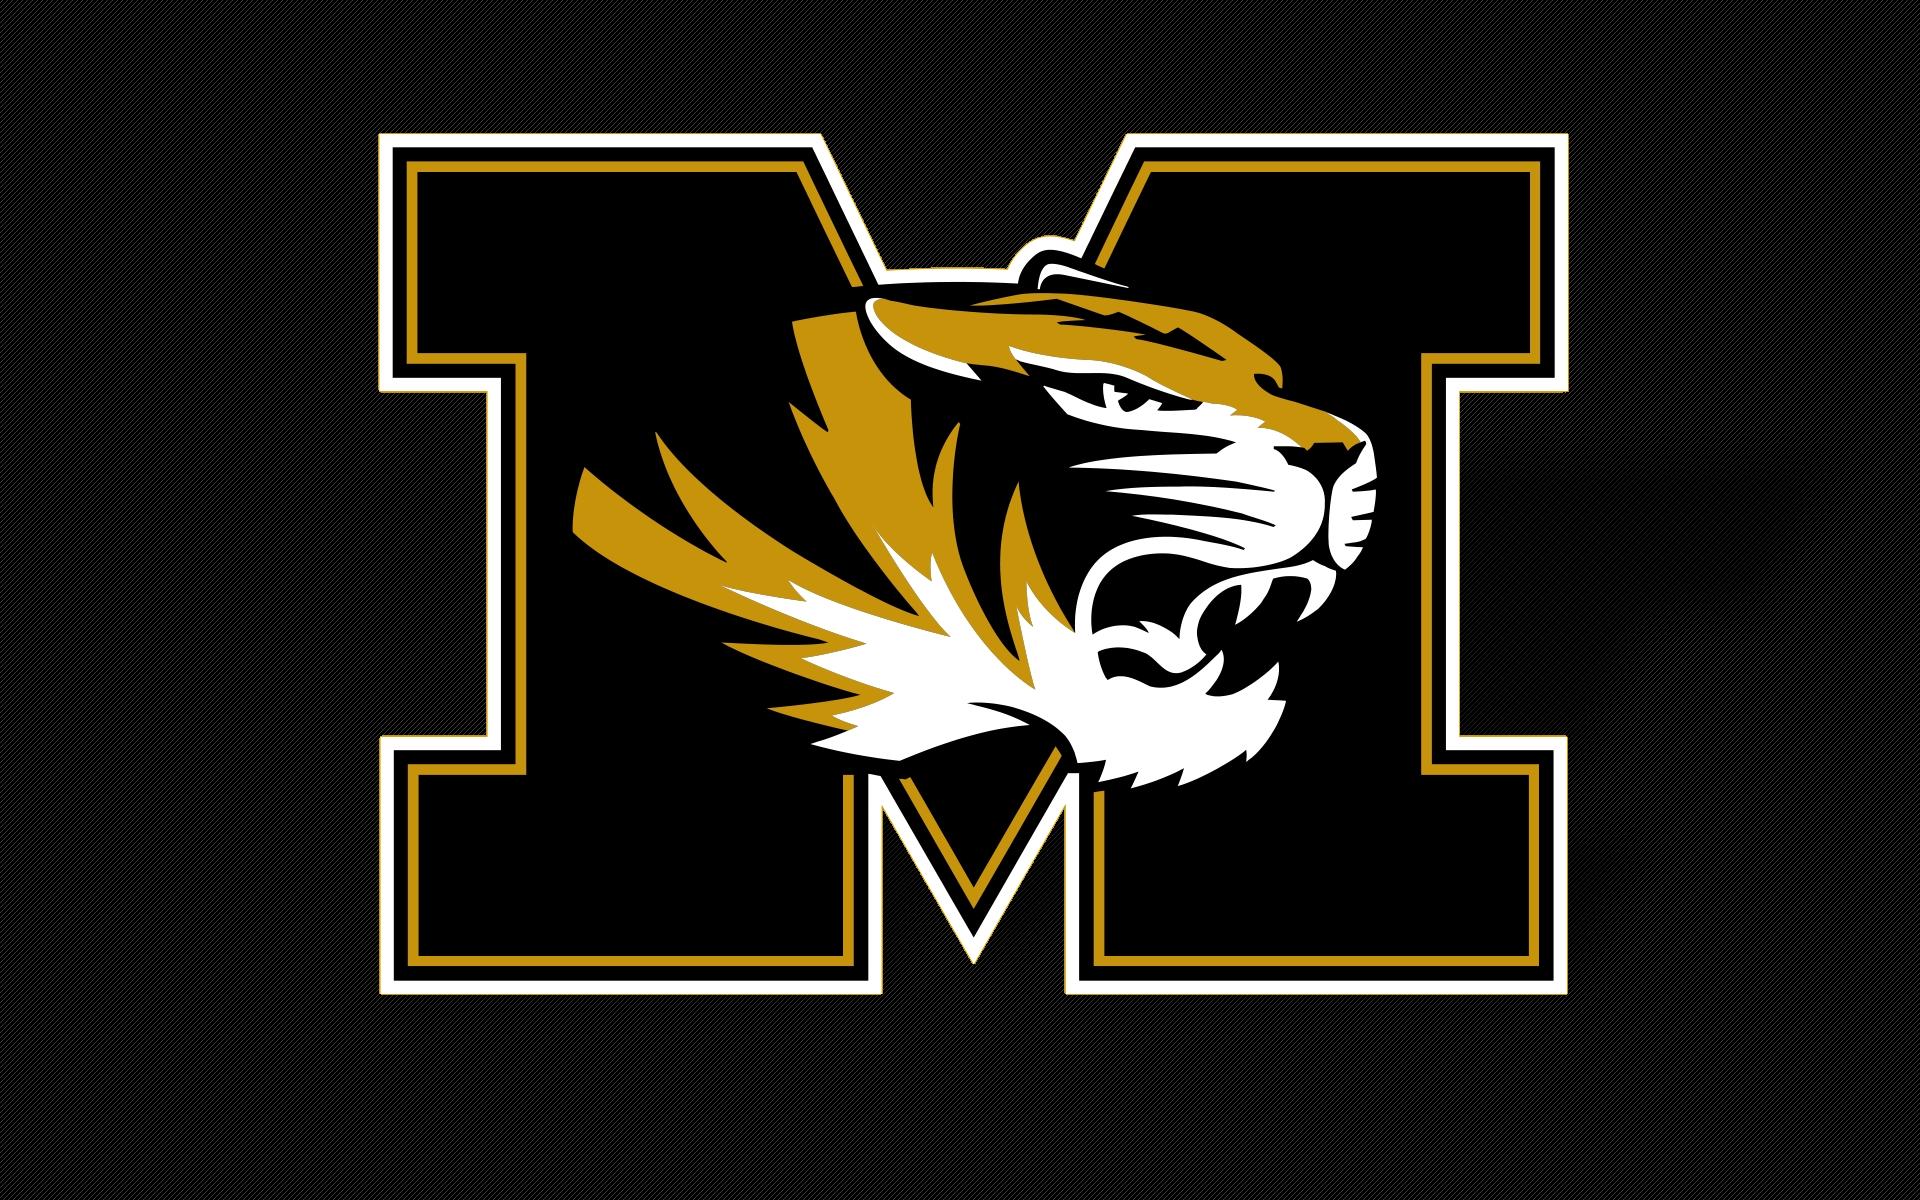 Mizzou Tigers My Favorite College Football Team Mizzou Football Mizzou Tigers Mizzou